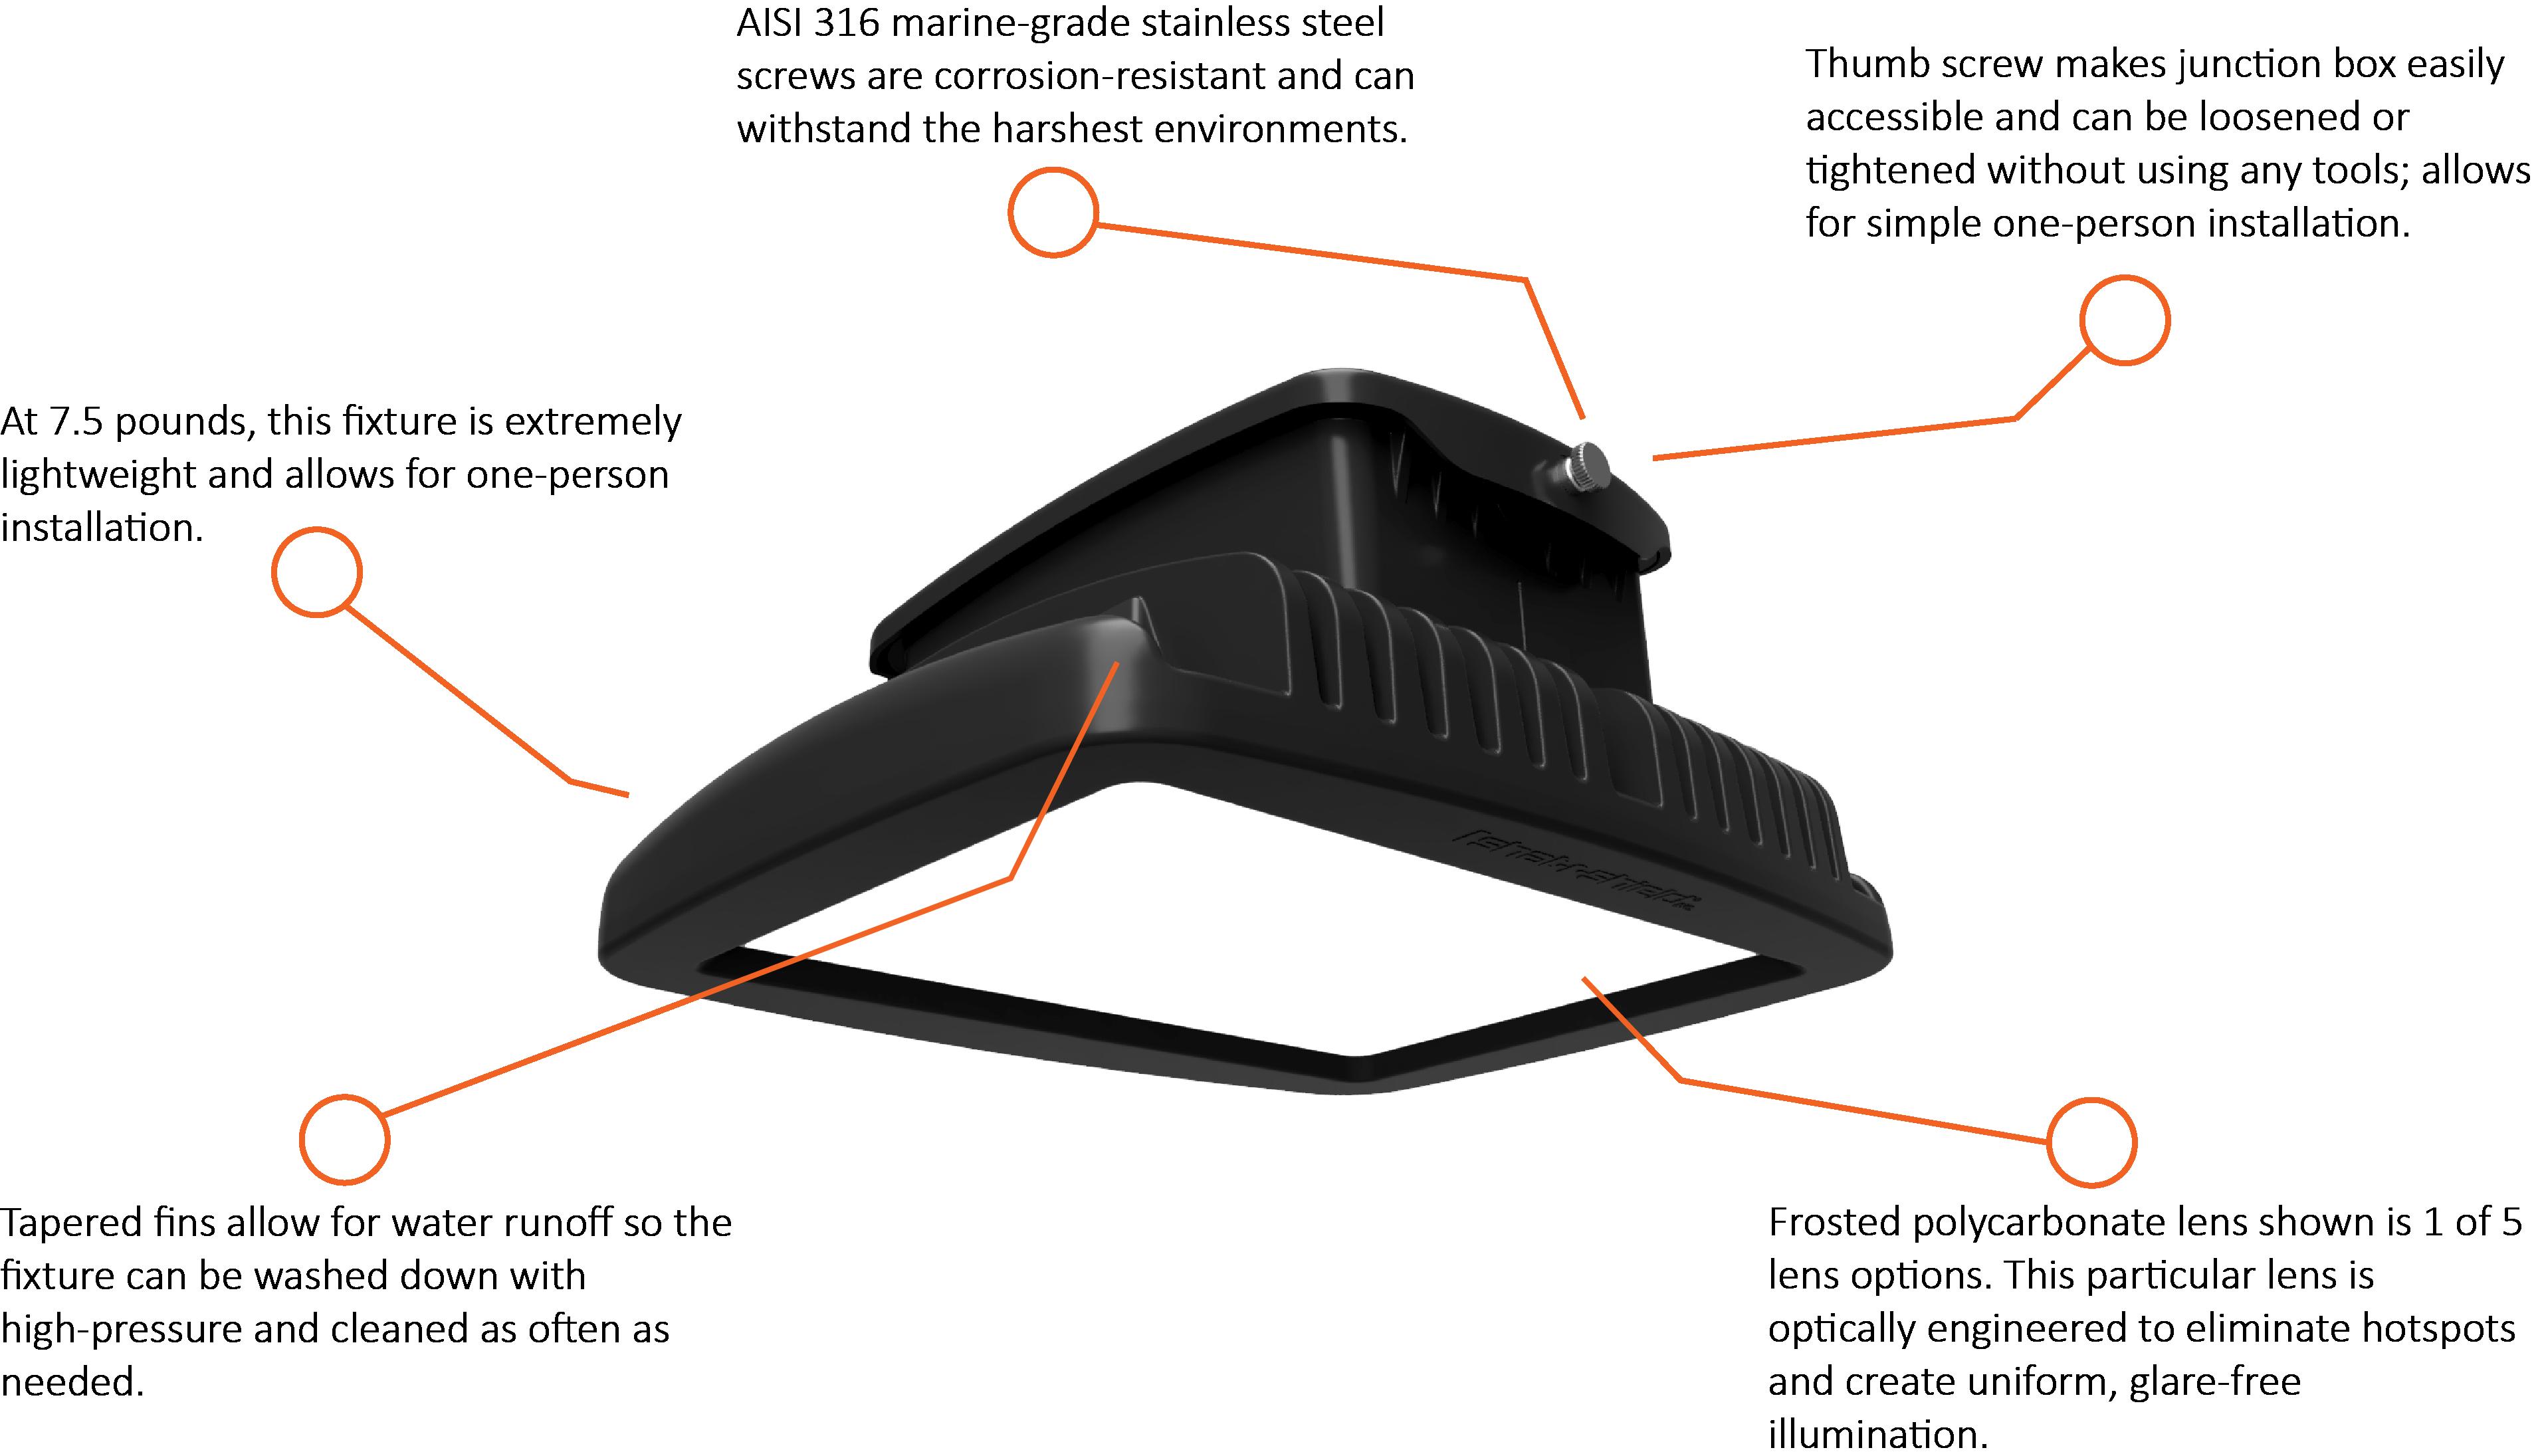 Shat R Shield Incoplas Led Hybrid Fixture Wiring Diagram 120 Volt Light Design Elements